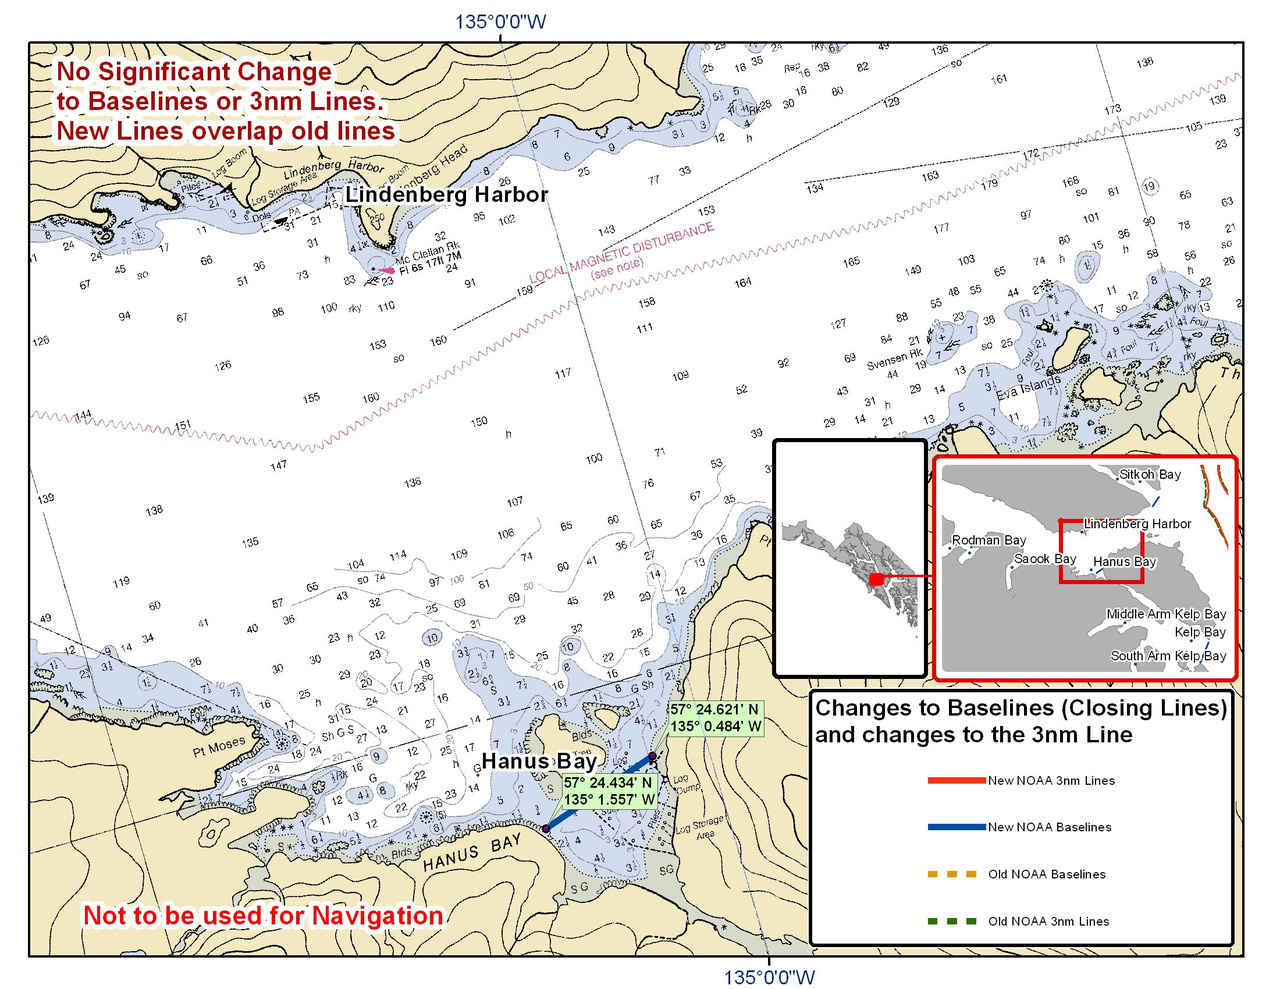 Chart for Hanus Bay